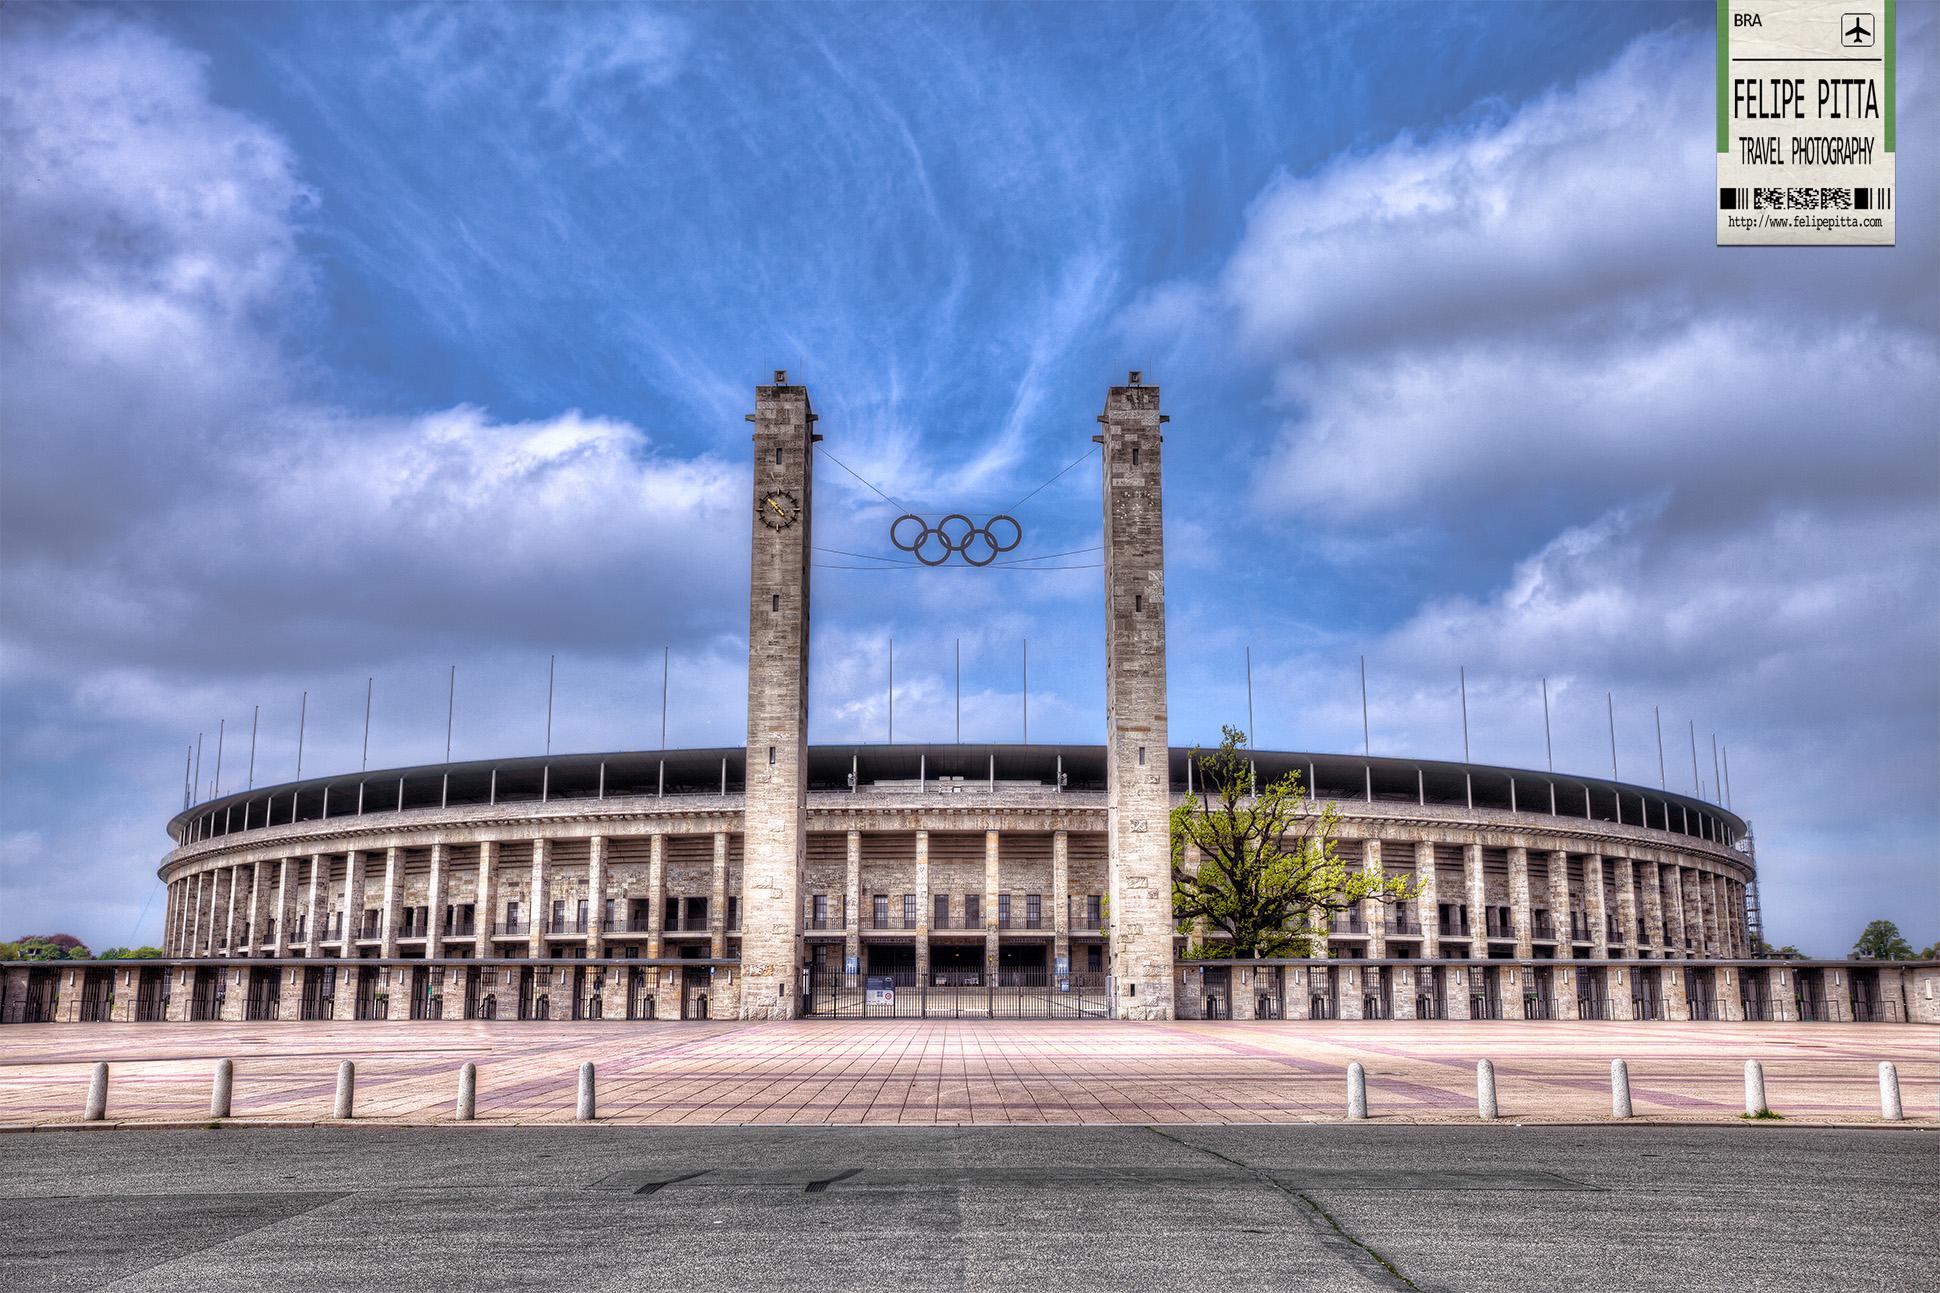 Olympic Stadium Berlin Germany